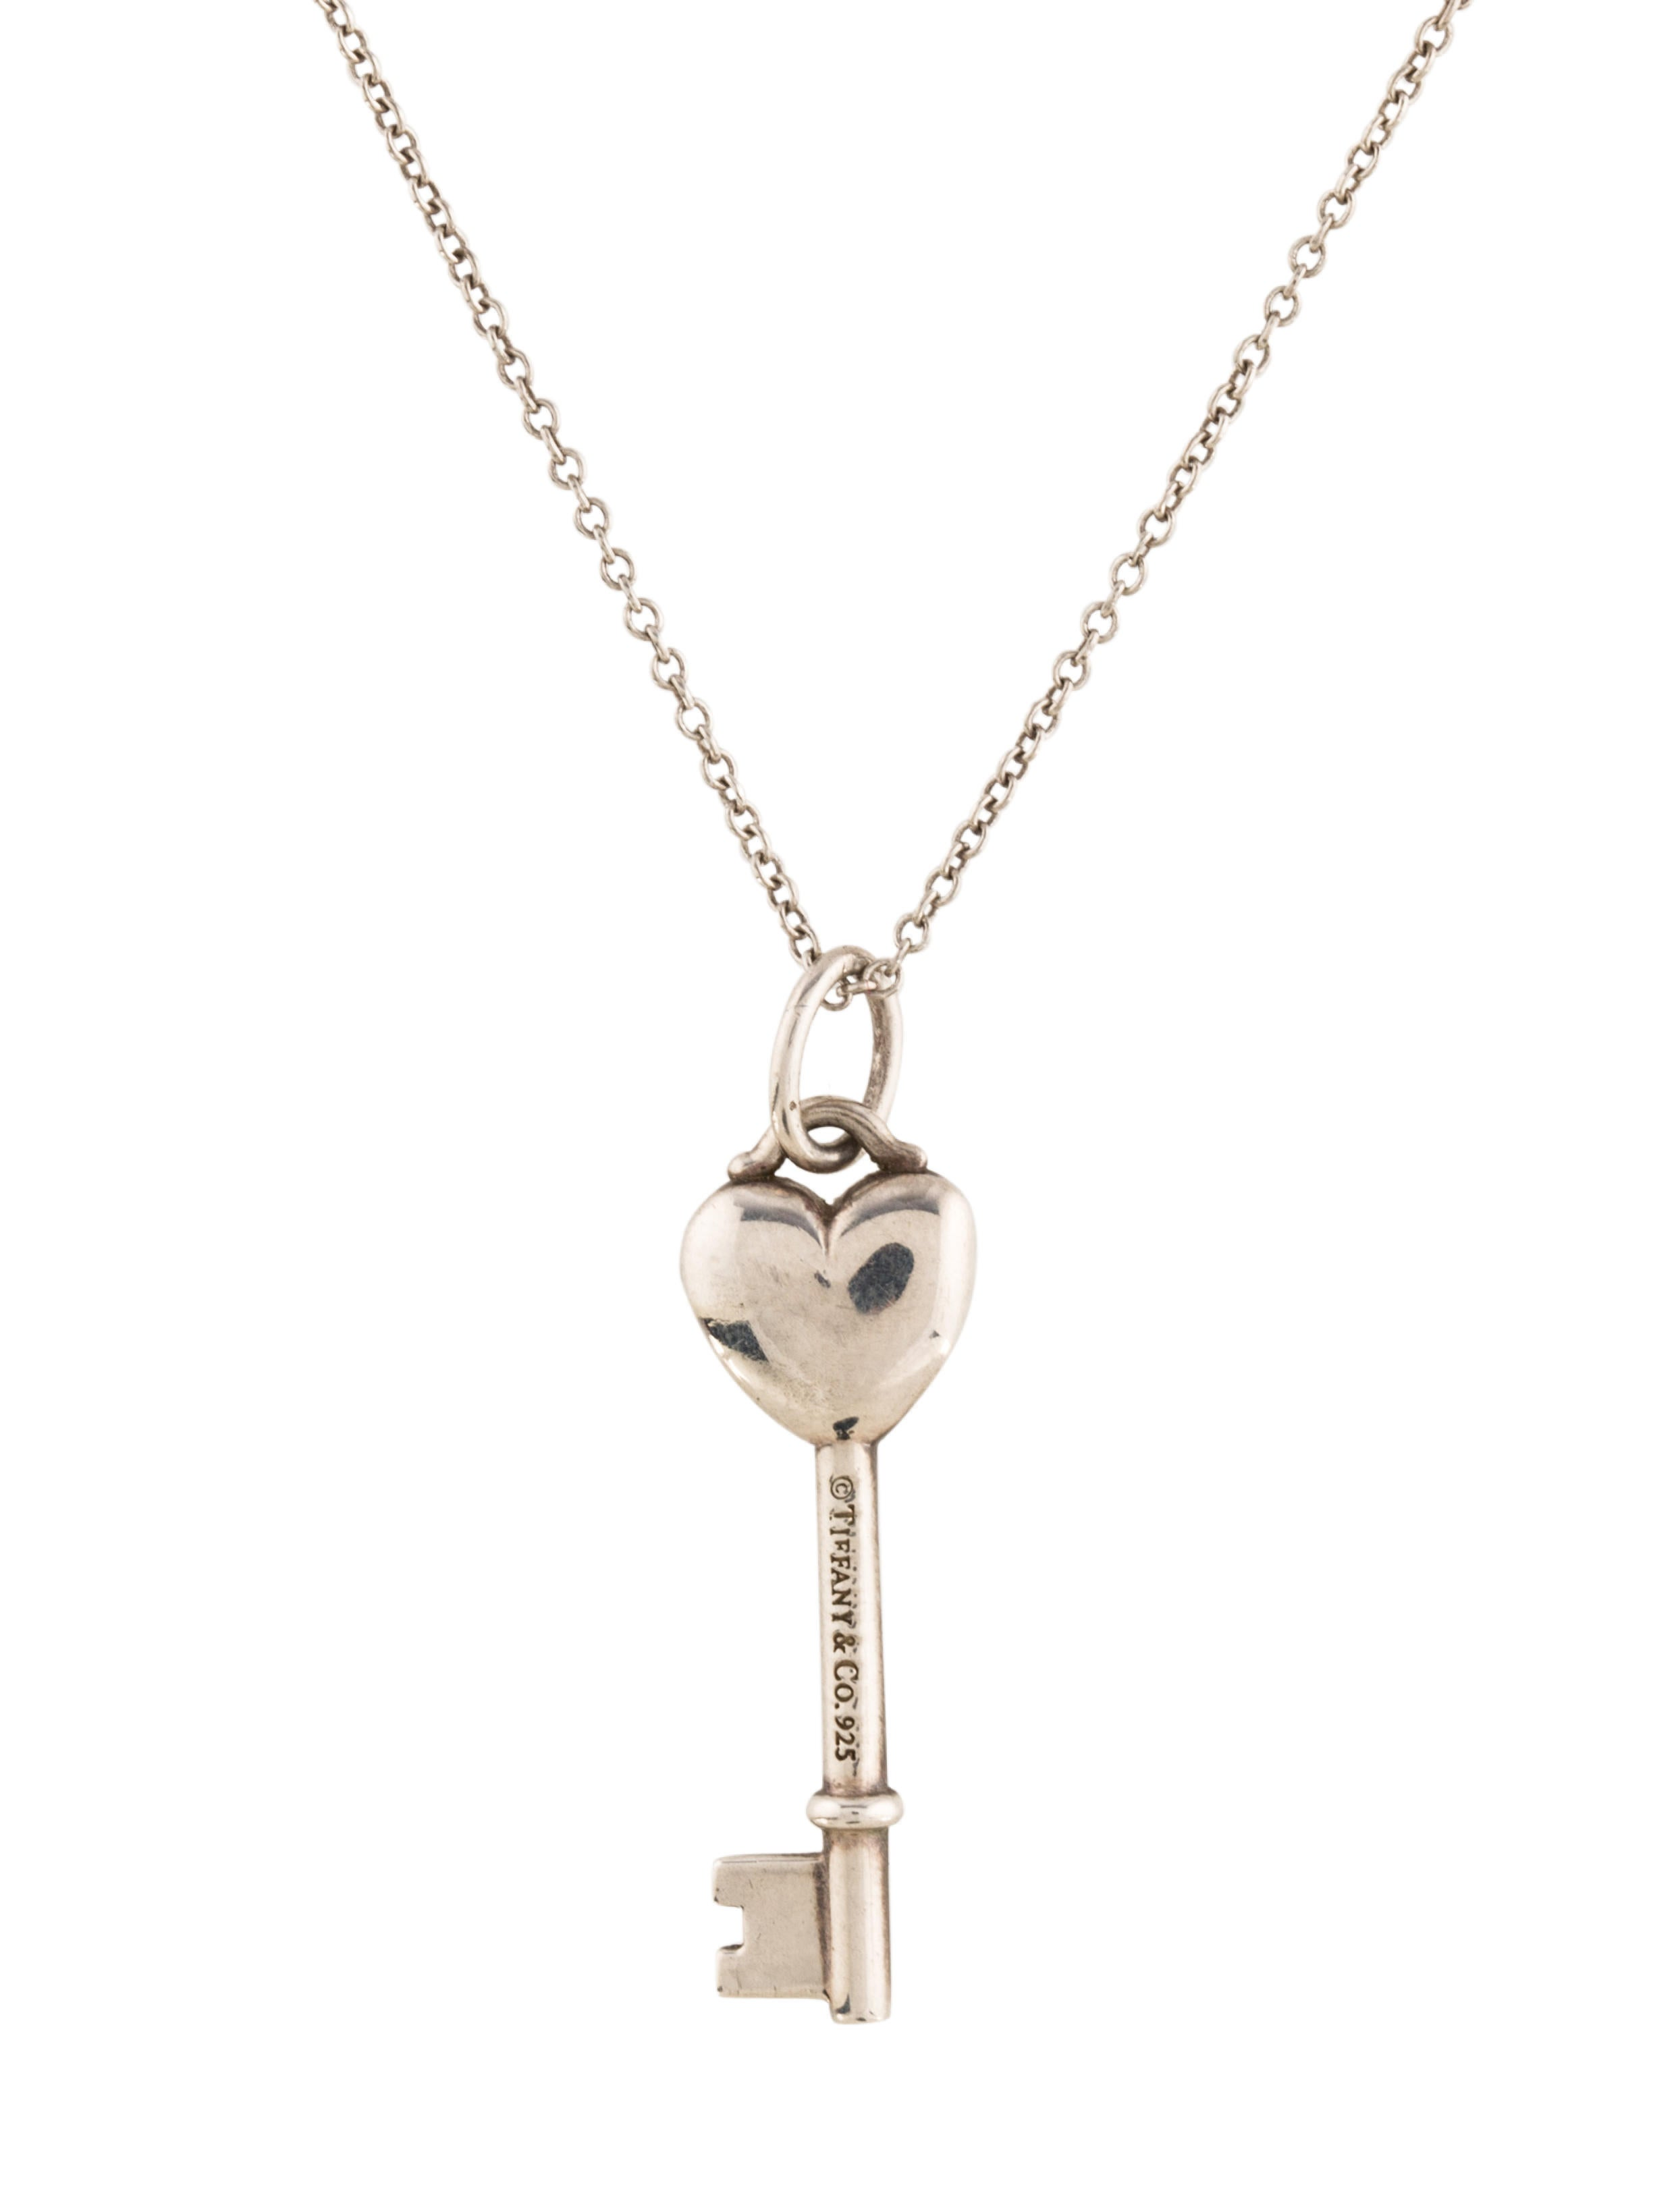 Tiffany co diamond heart key pendant necklace necklaces diamond heart key pendant necklace mozeypictures Images